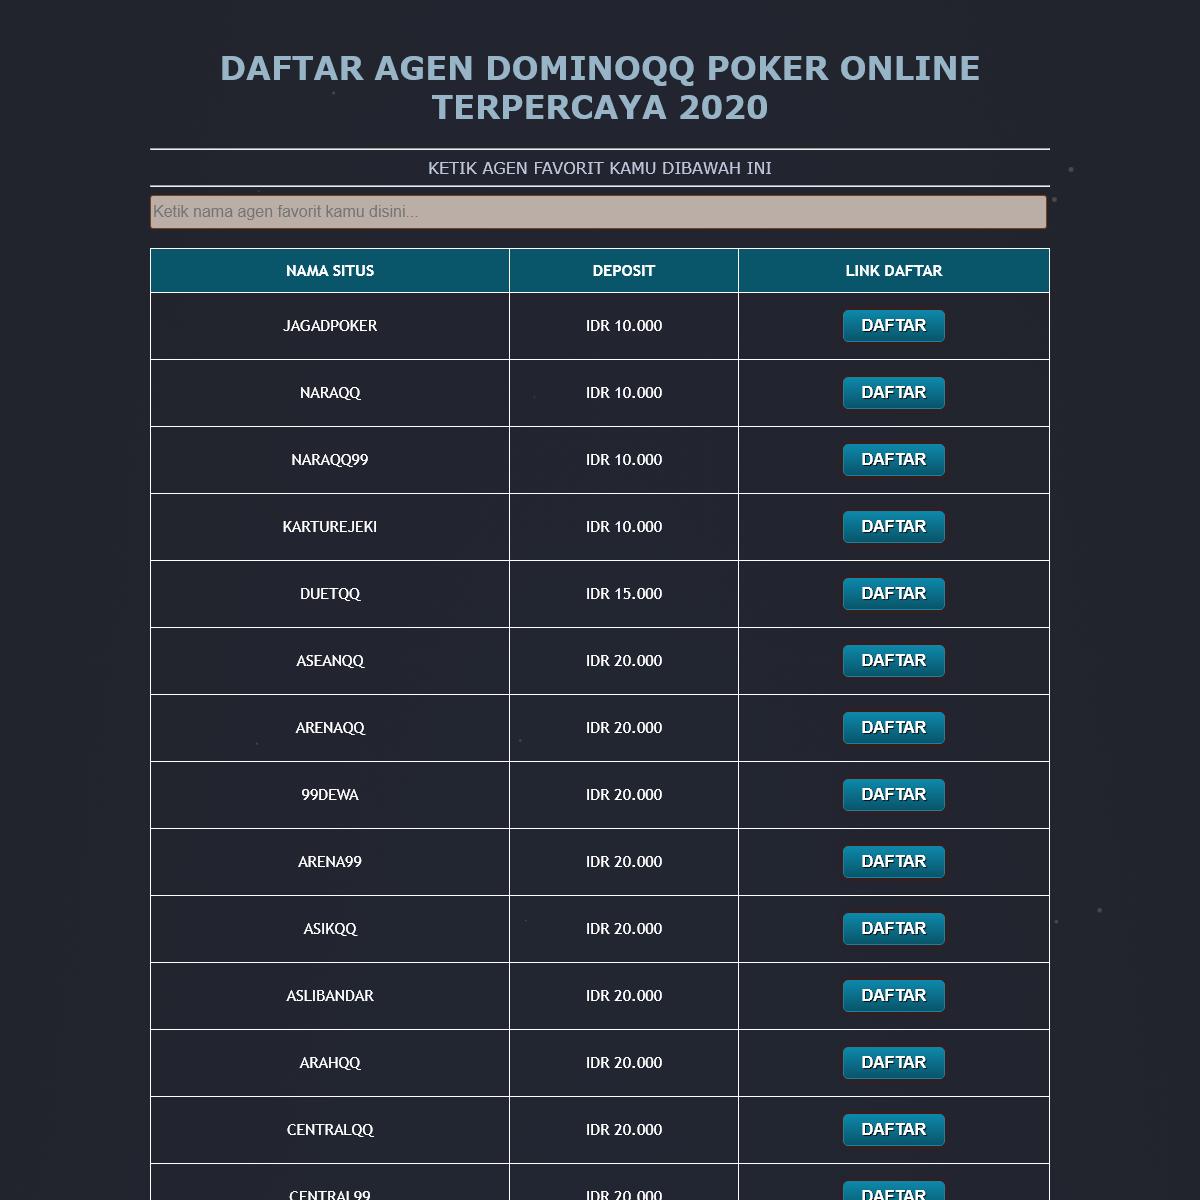 Daftar agen dominoqq poker online terpercaya 2020